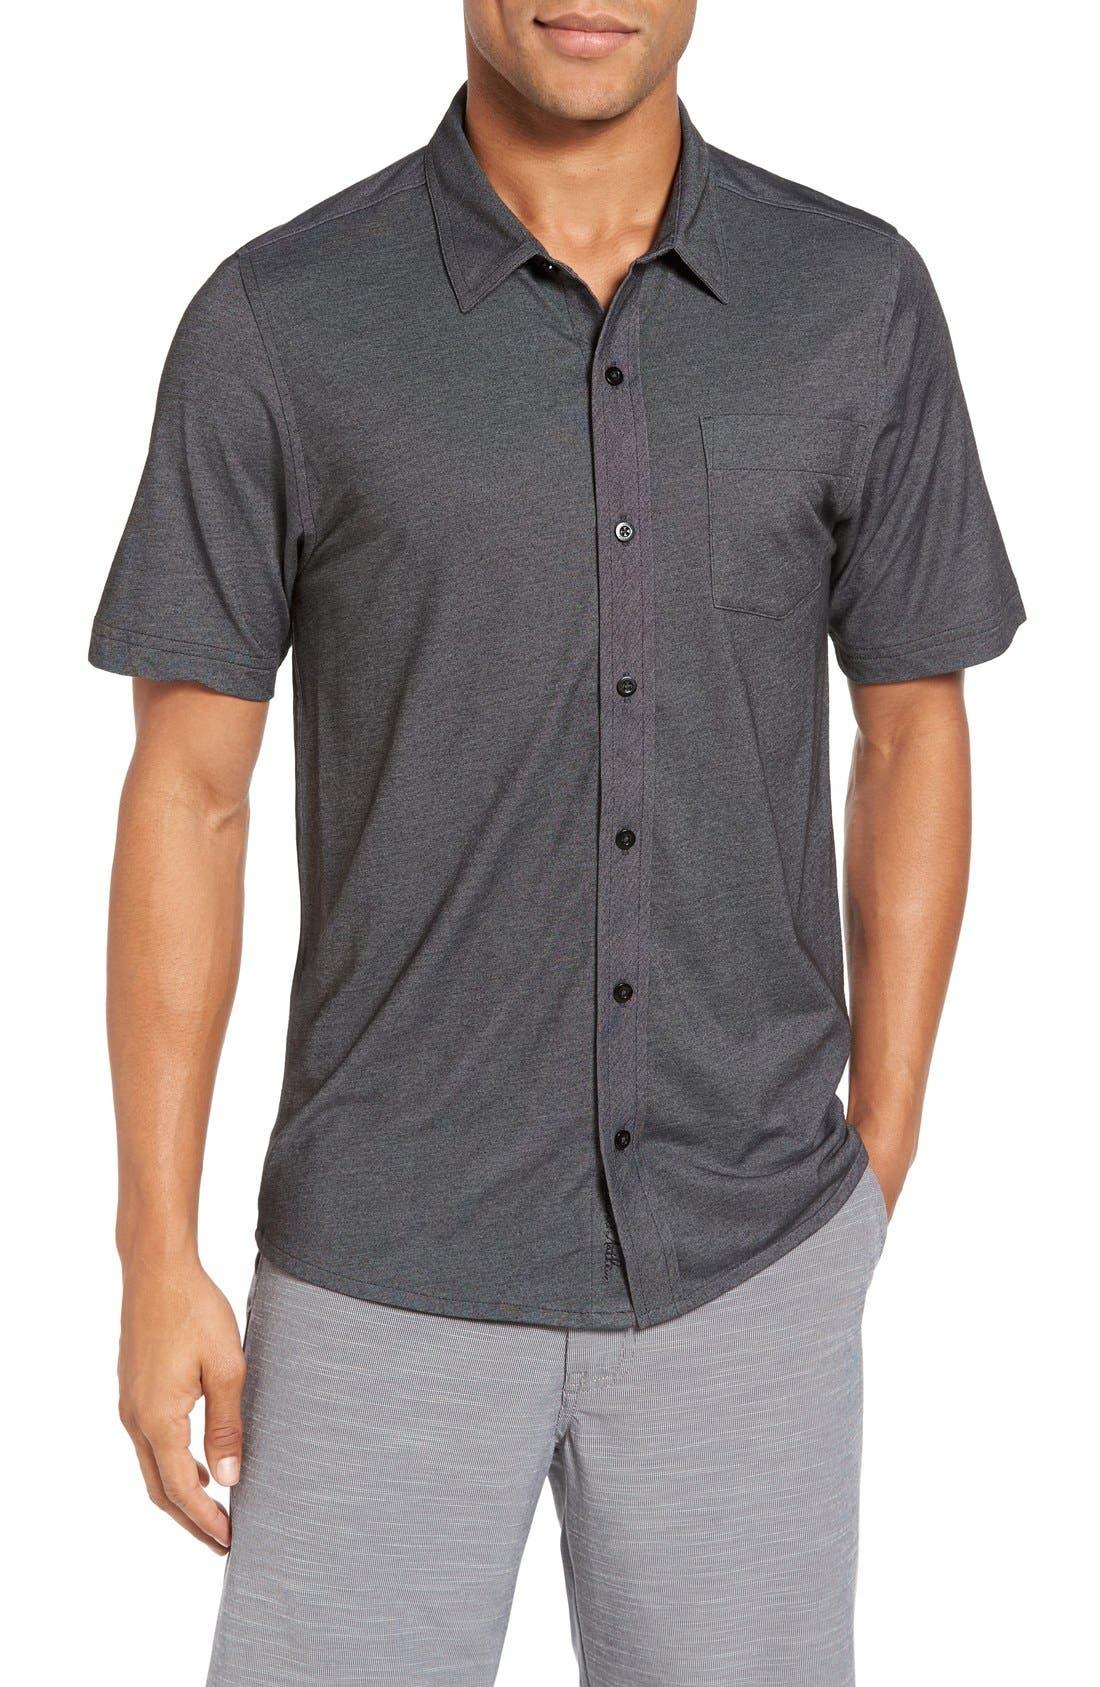 Main Image - Travis Mathew Hines Slim Fit Wrinkle Resistant Sport Shirt